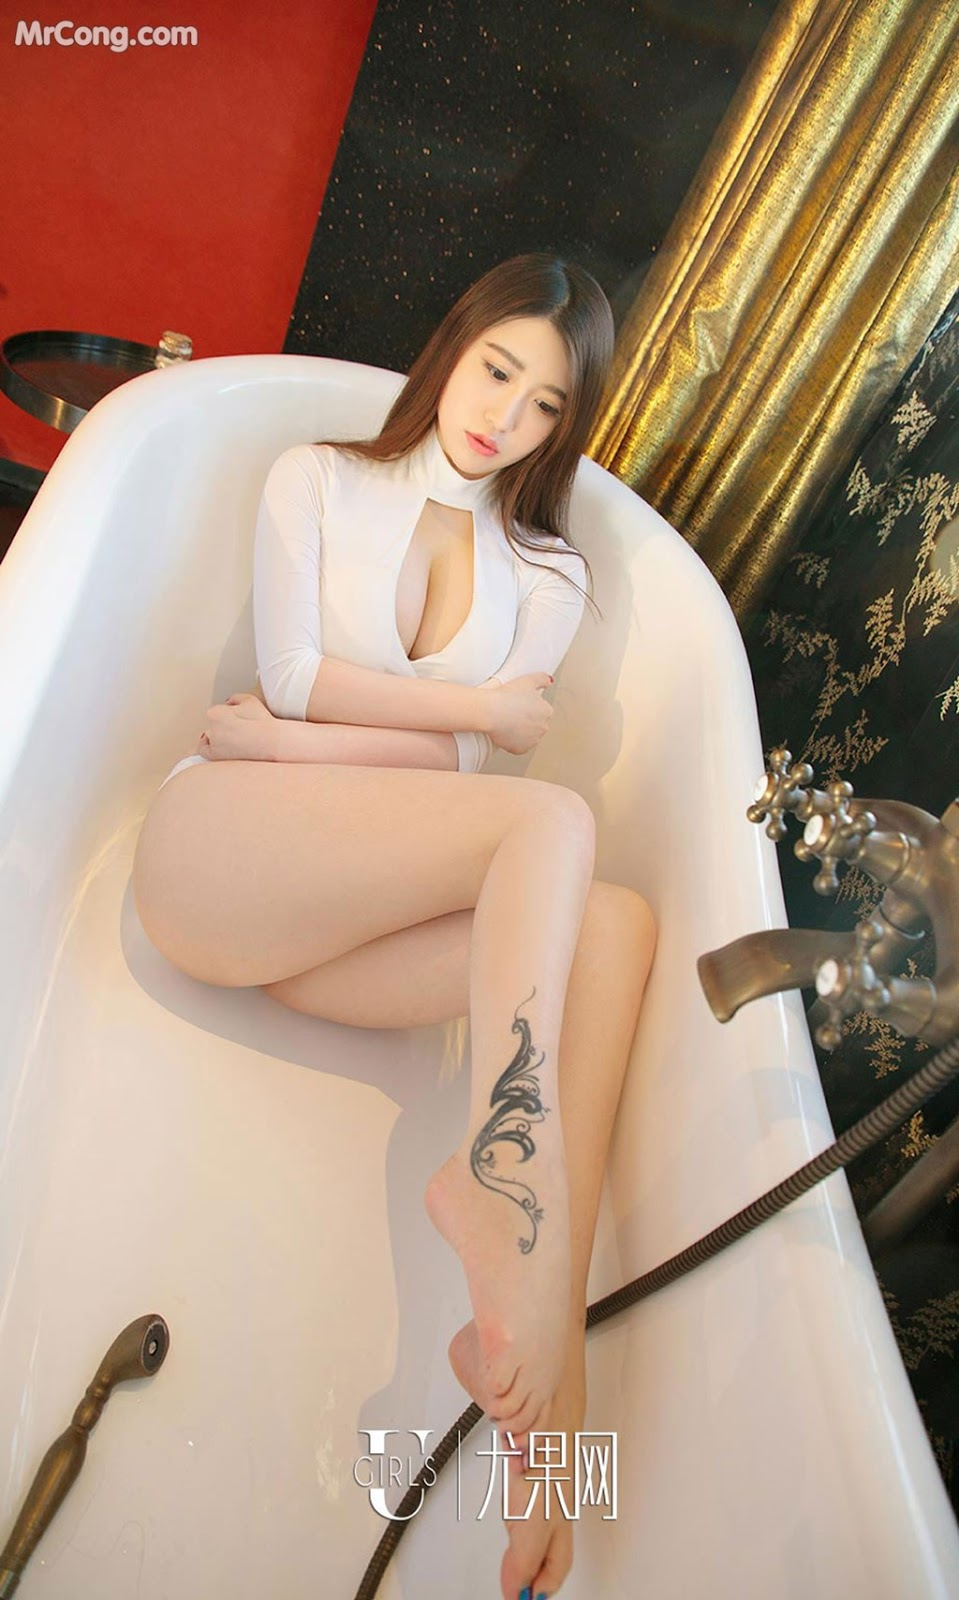 Image UGIRLS-Ai-You-Wu-App-No.964-Ai-Miao-MrCong.com-002 in post UGIRLS – Ai You Wu App No.964: Người mẫu Ai Miao (艾淼) (40 ảnh)